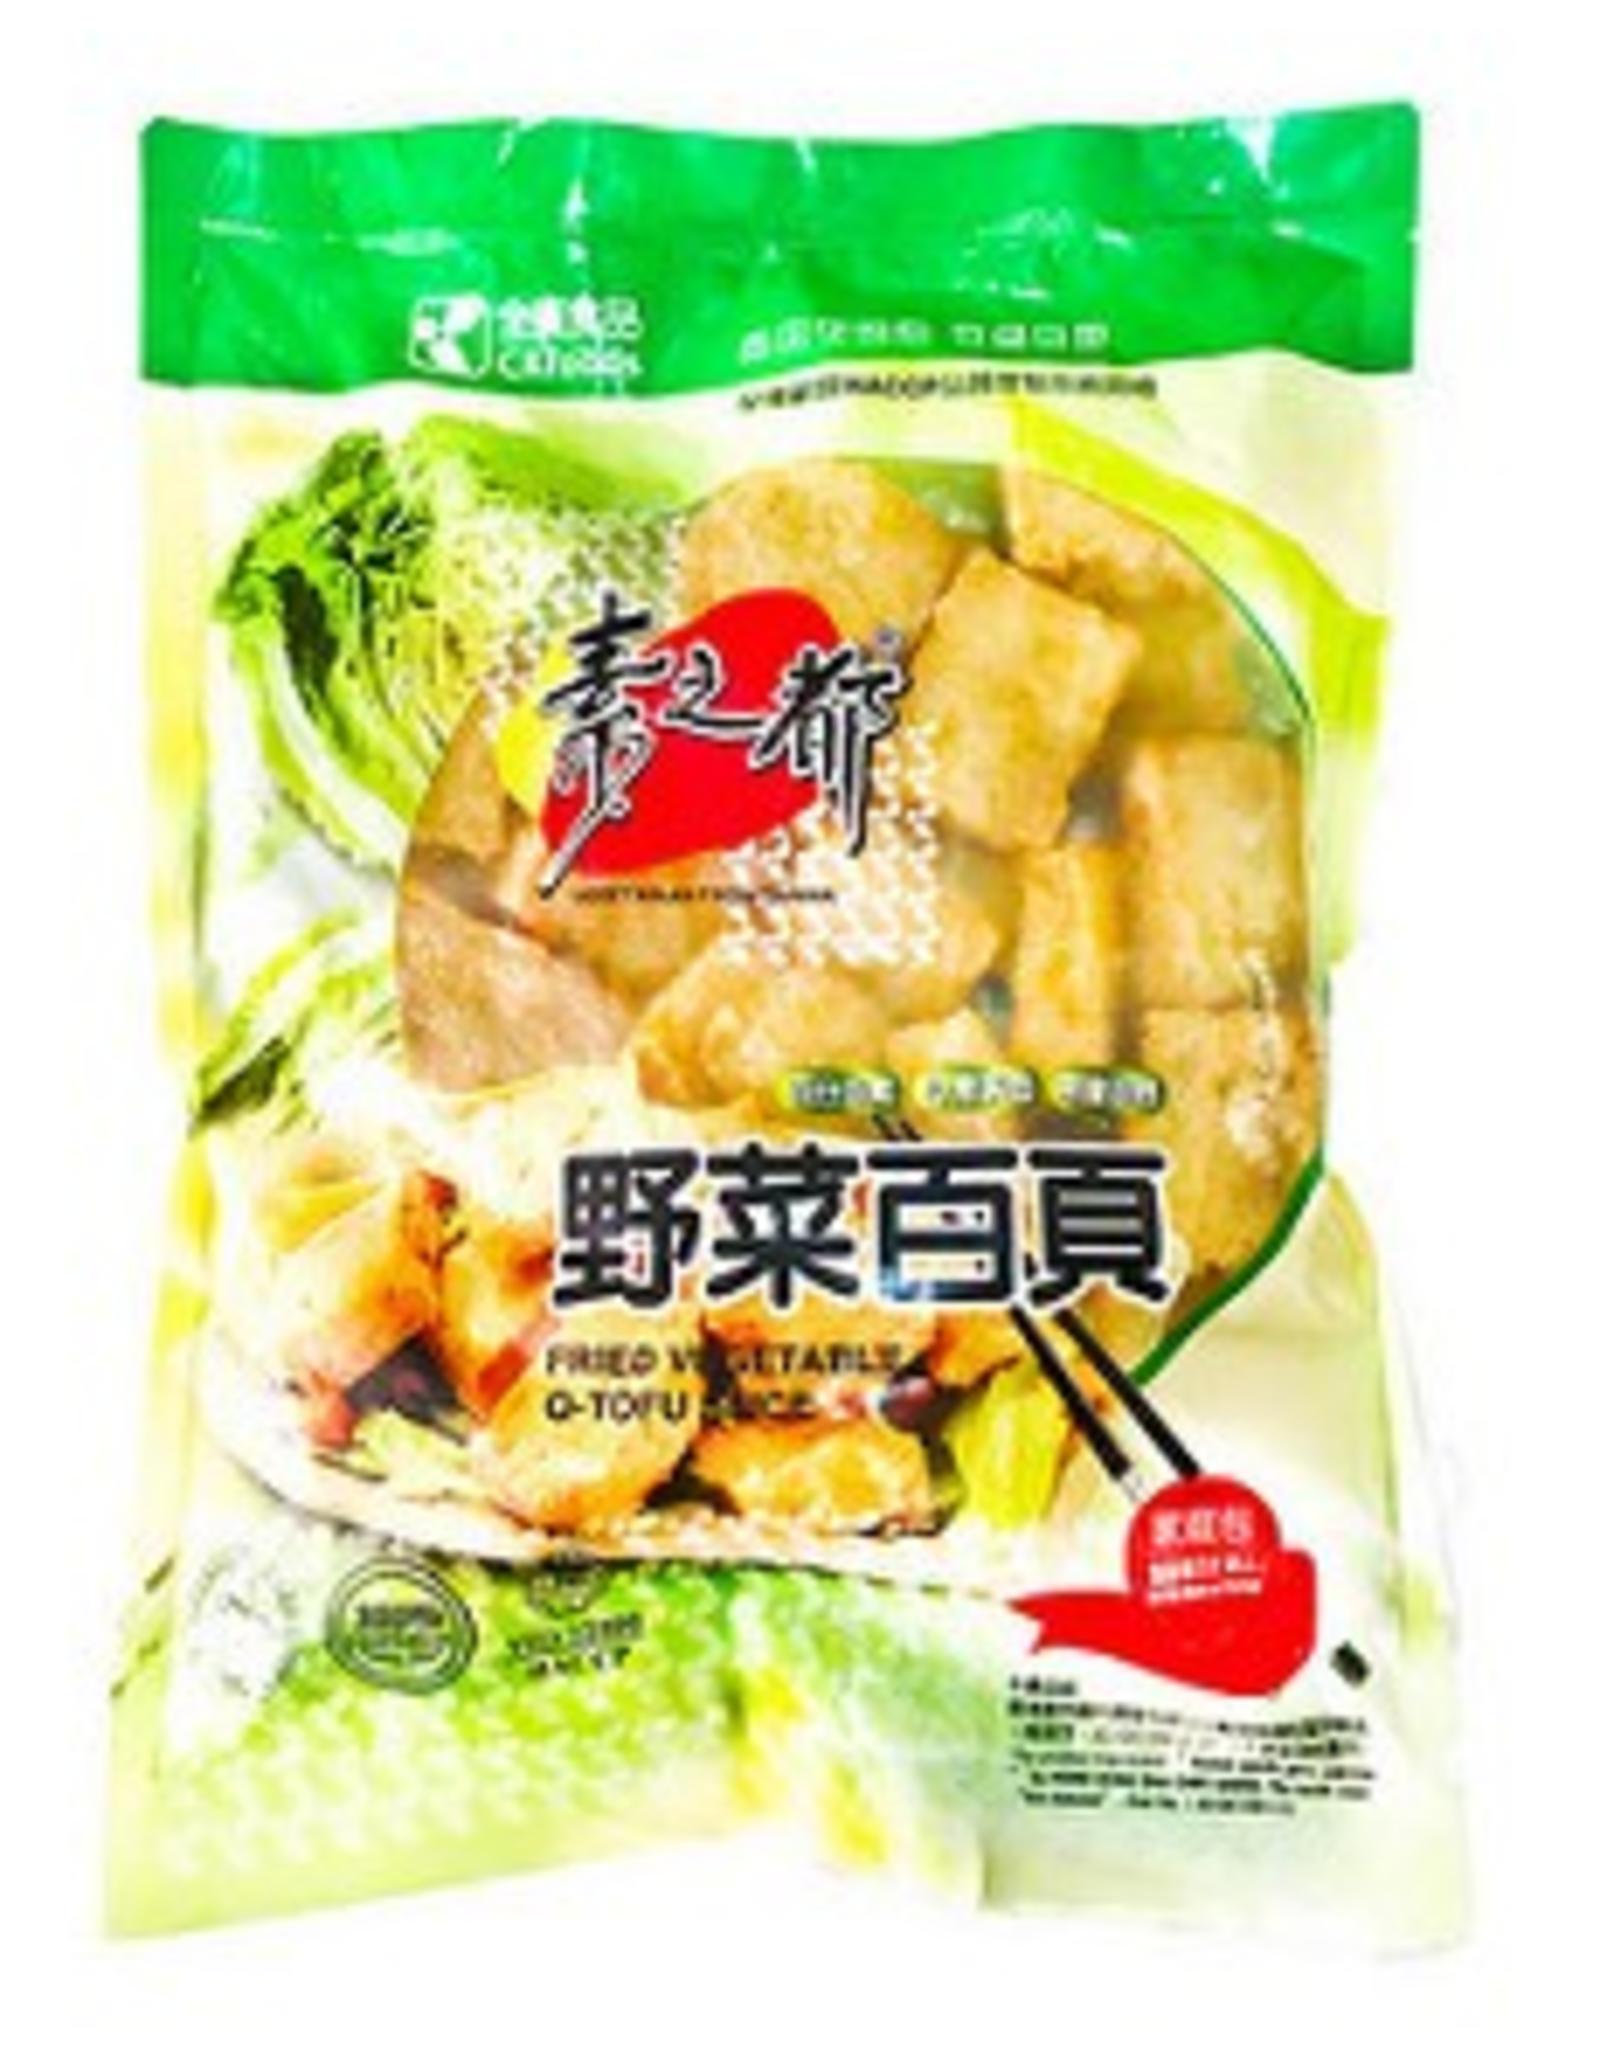 Chyuan Kuang * 全廣 (CK) Vegan Fried Vegetables Q-Tofu Slice (L)*(素之都) 野菜百頁豆腐 (L)